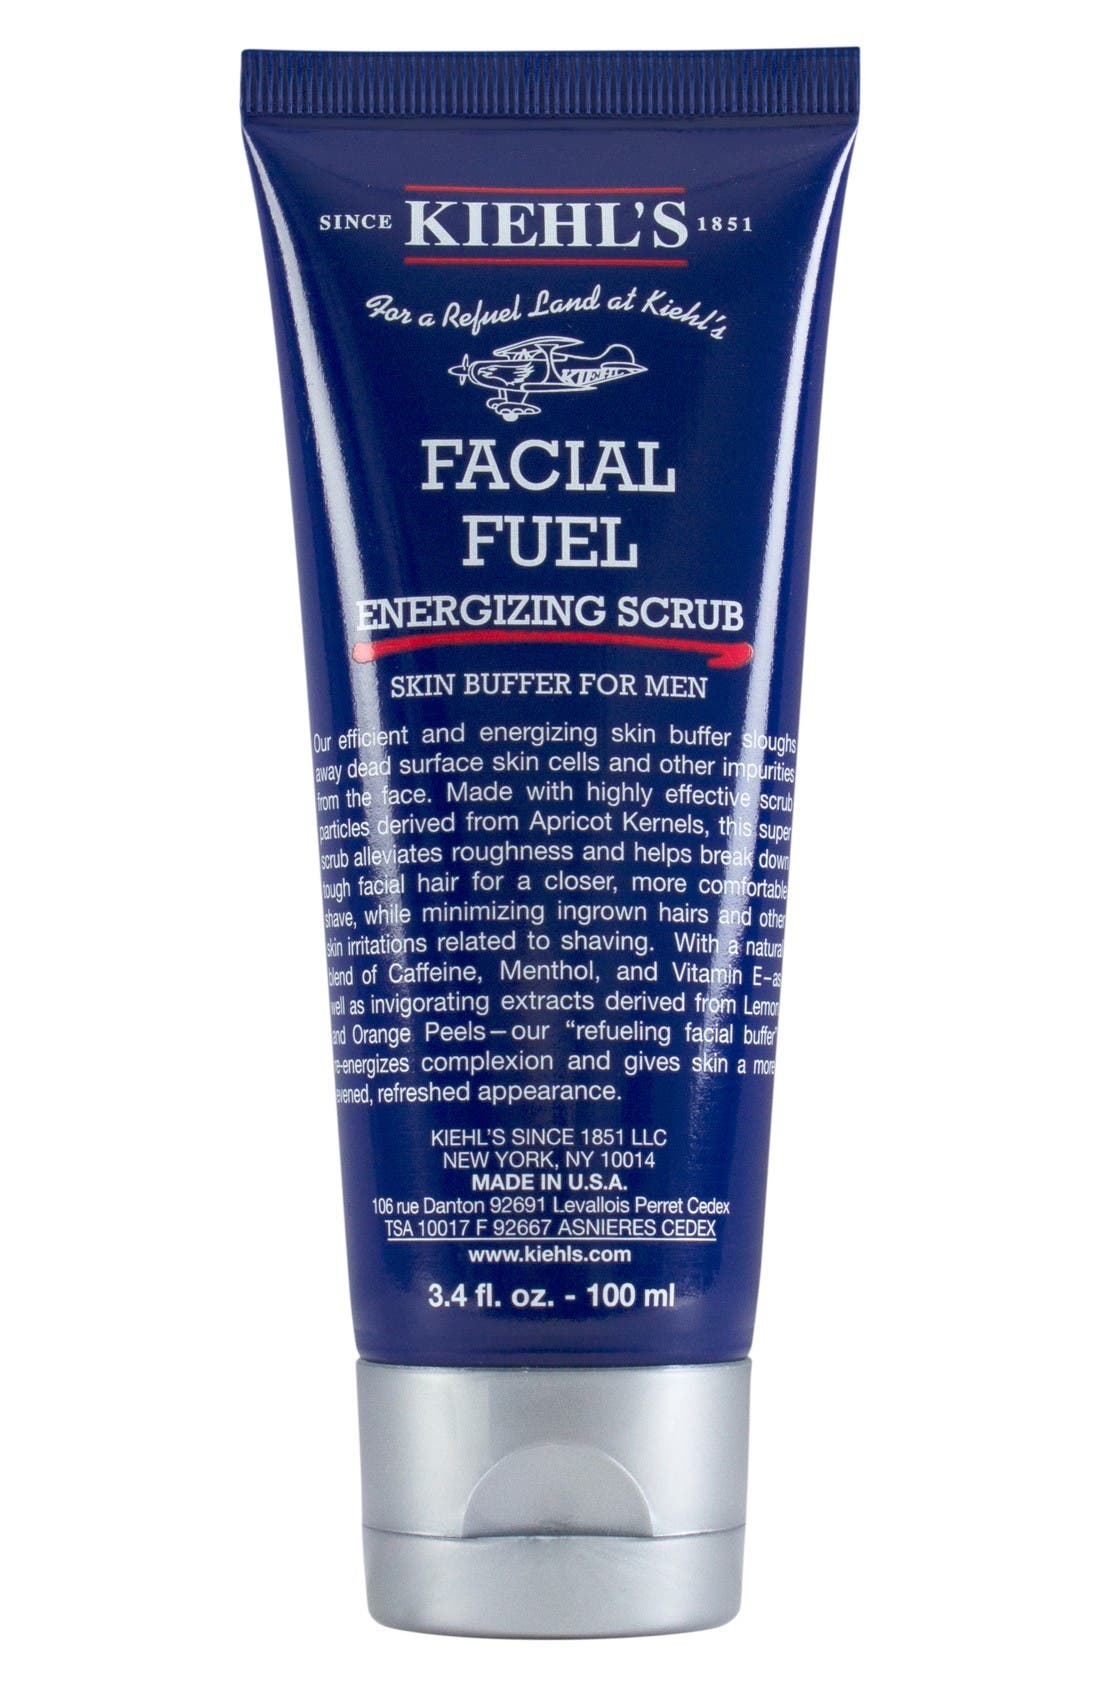 KIEHL'S SINCE 1851 Kiehl's Facial Fuel Energizing Scrub